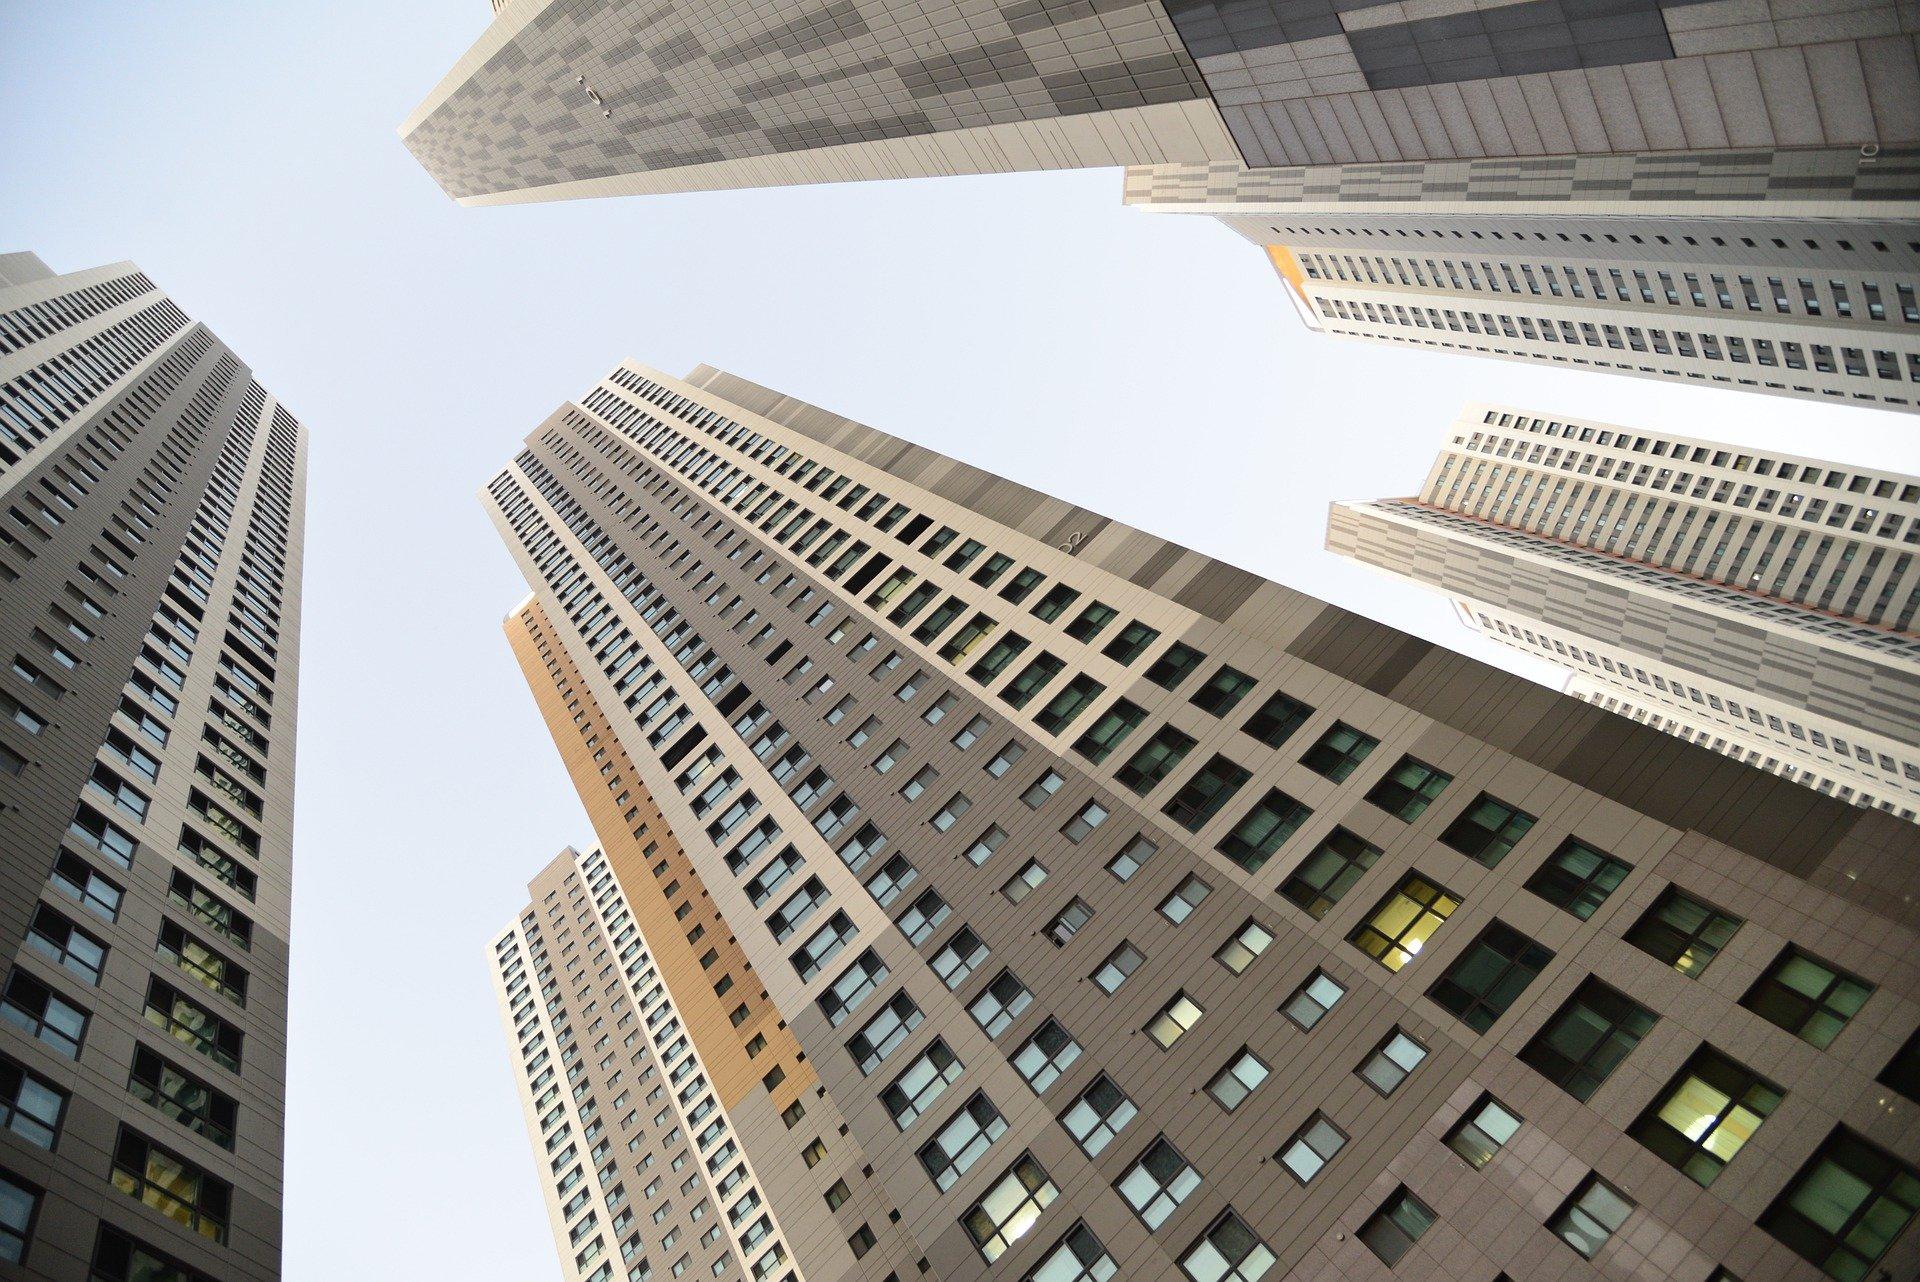 Fideicomiso Hipotecario contrata línea de crédito por 2 mil 600 mdp